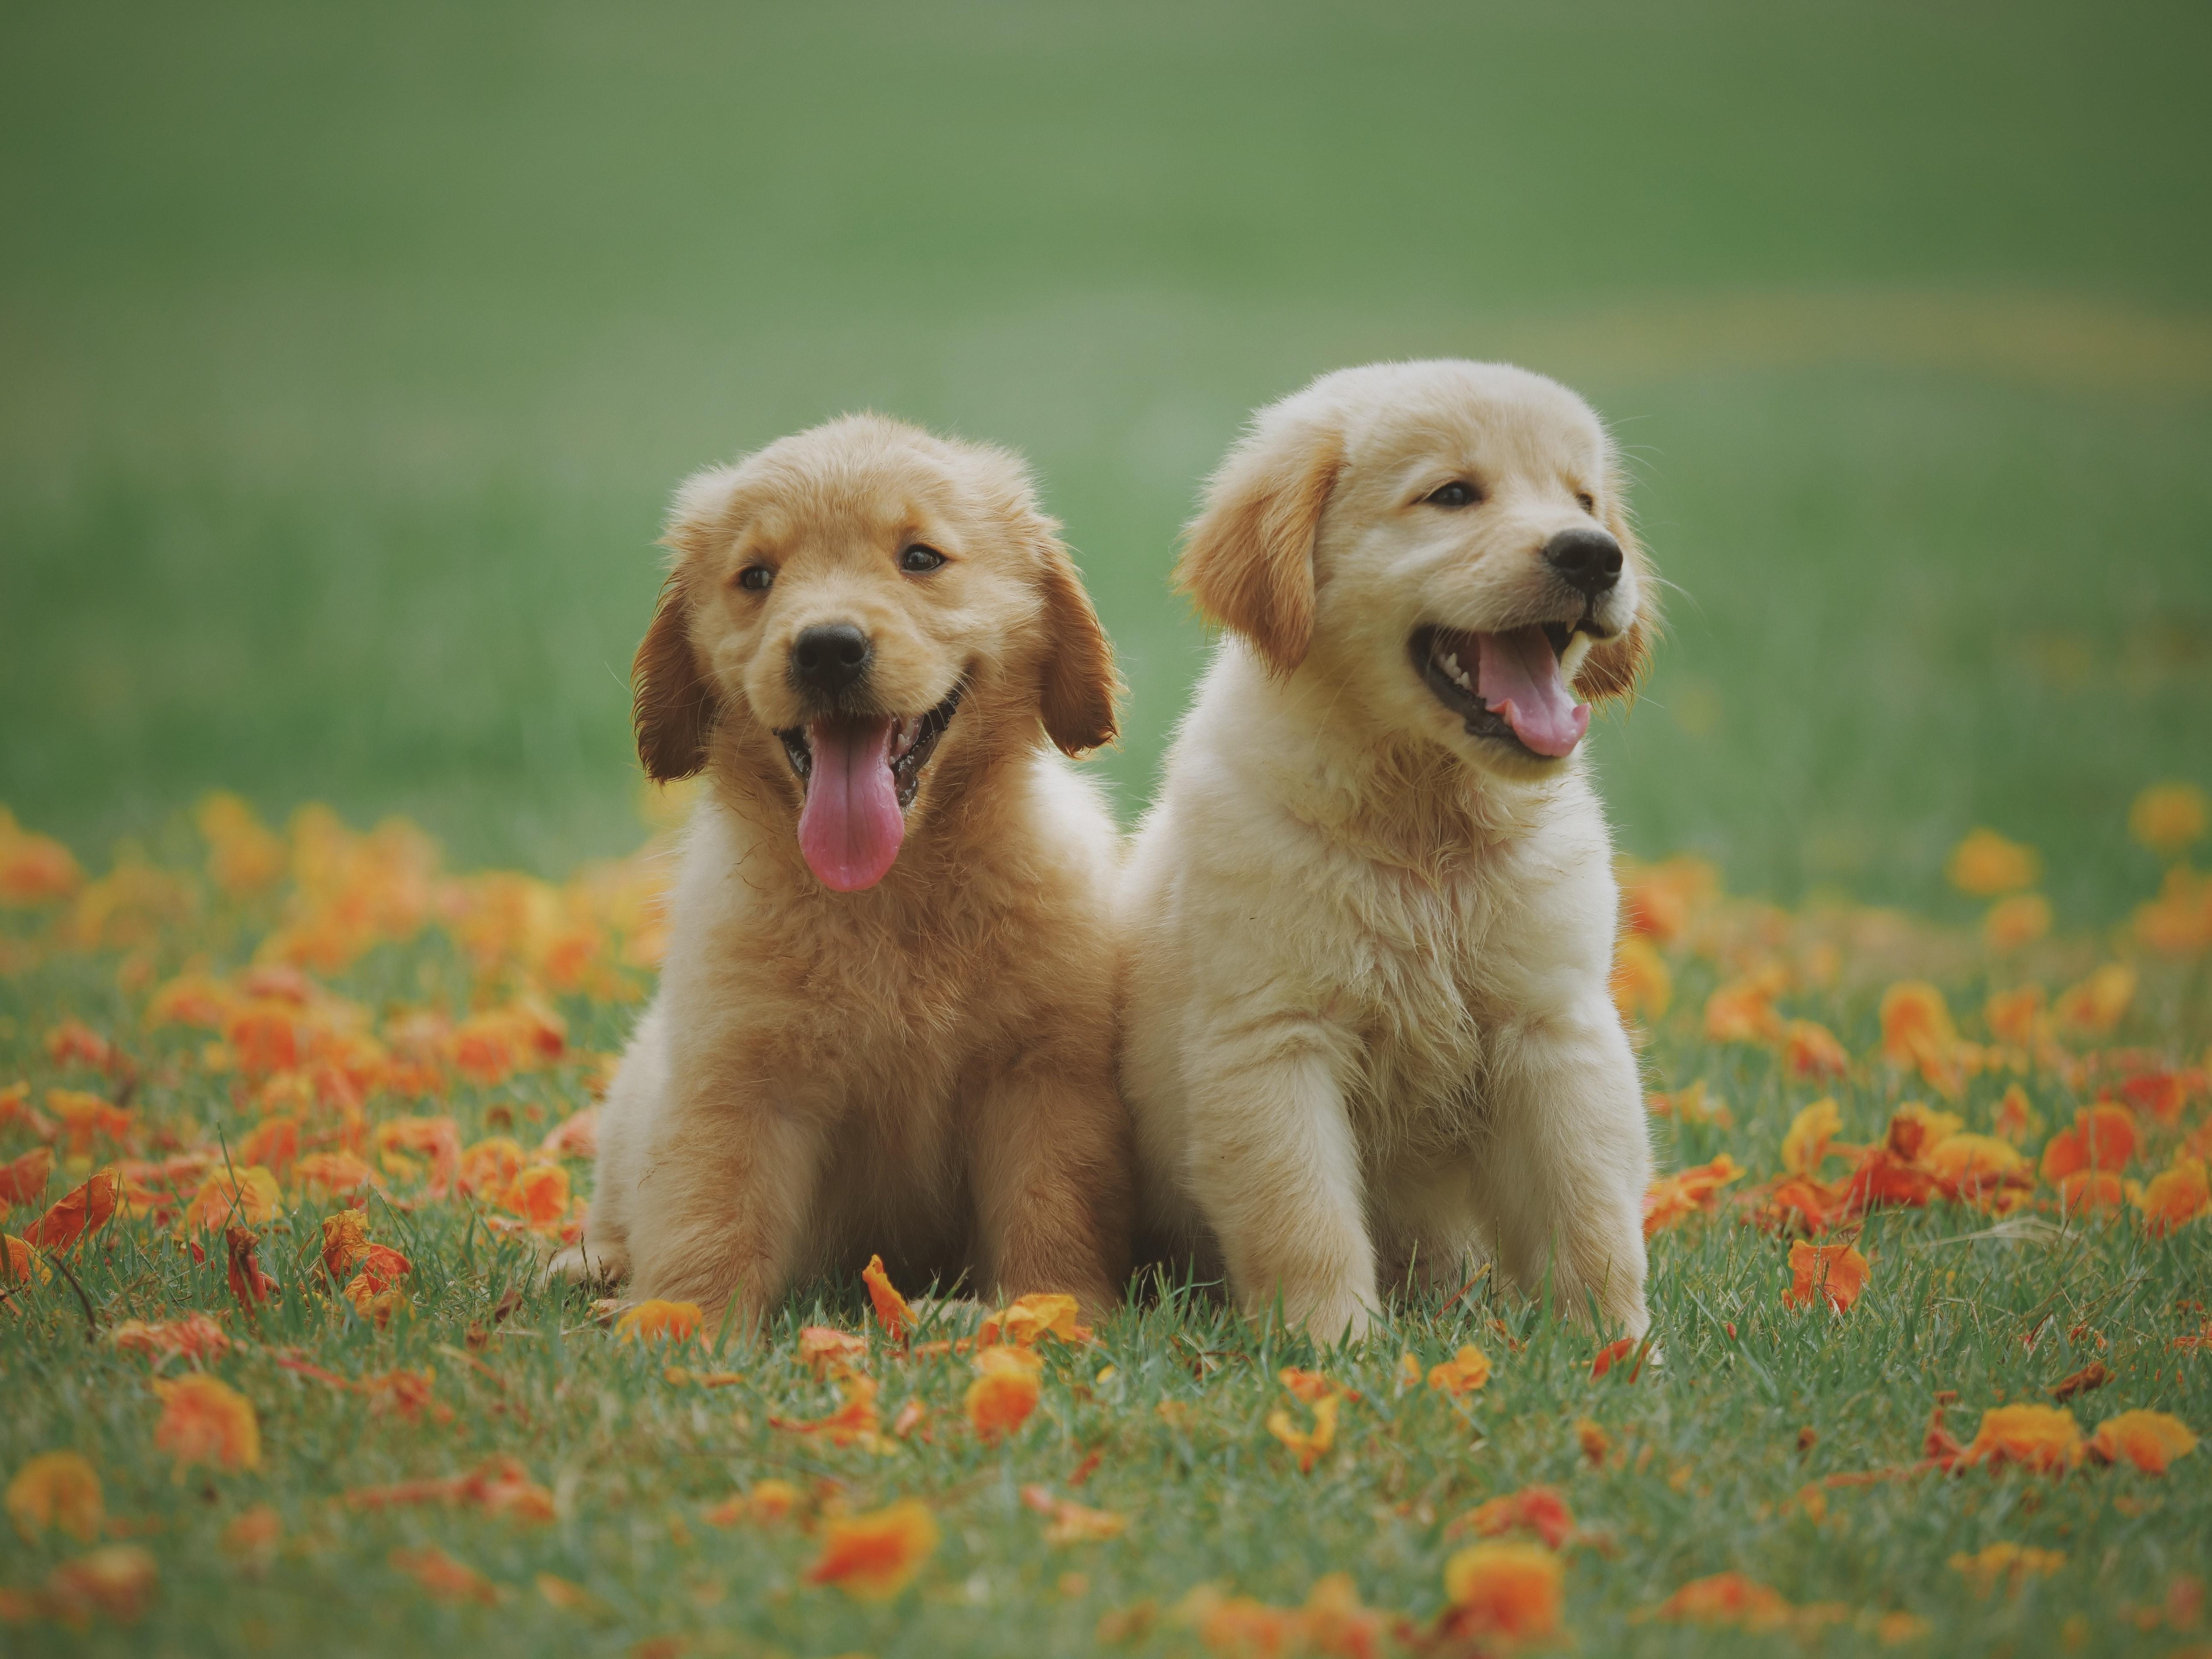 Foto Stok Gratis Tentang Anak Anjing Anjing Anjing Golden Retriever